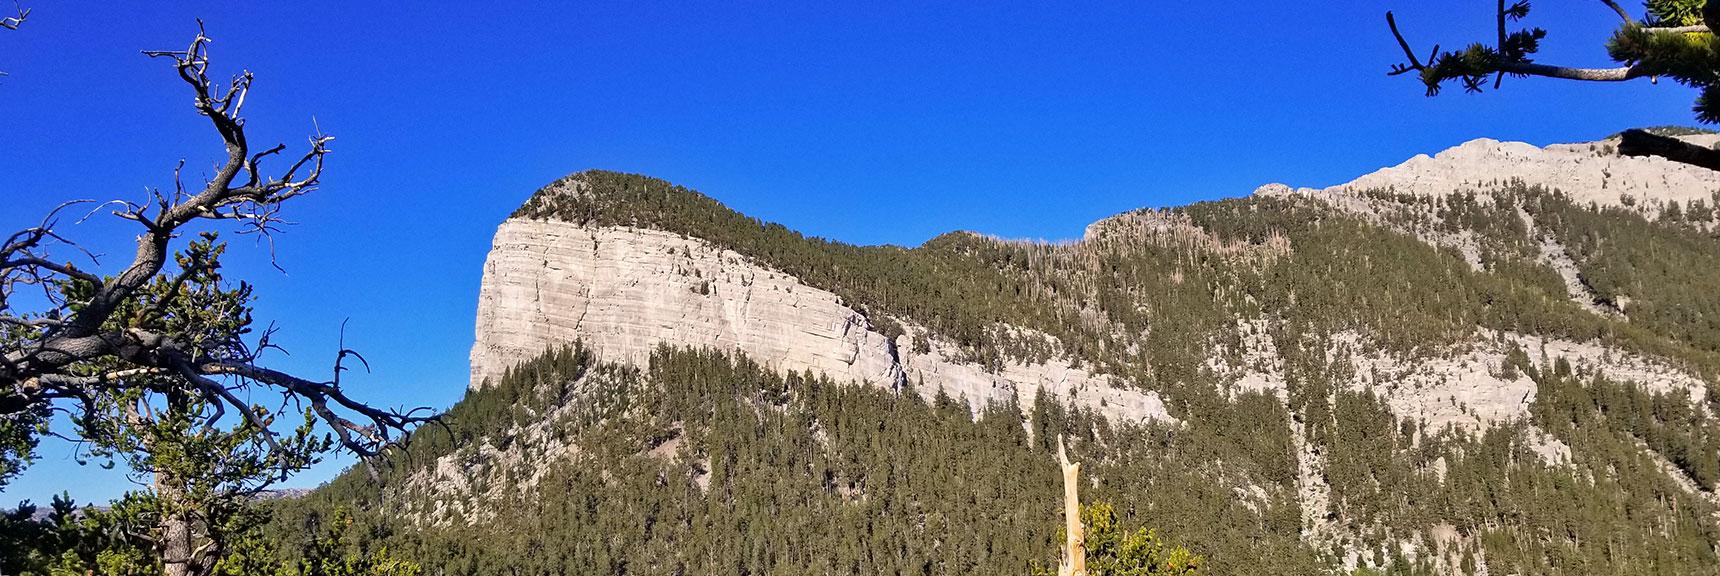 View from High Ridge on North Loop Trail, Mummy Mountain's Toe, Mt. Charleston Wilderness, Nevada